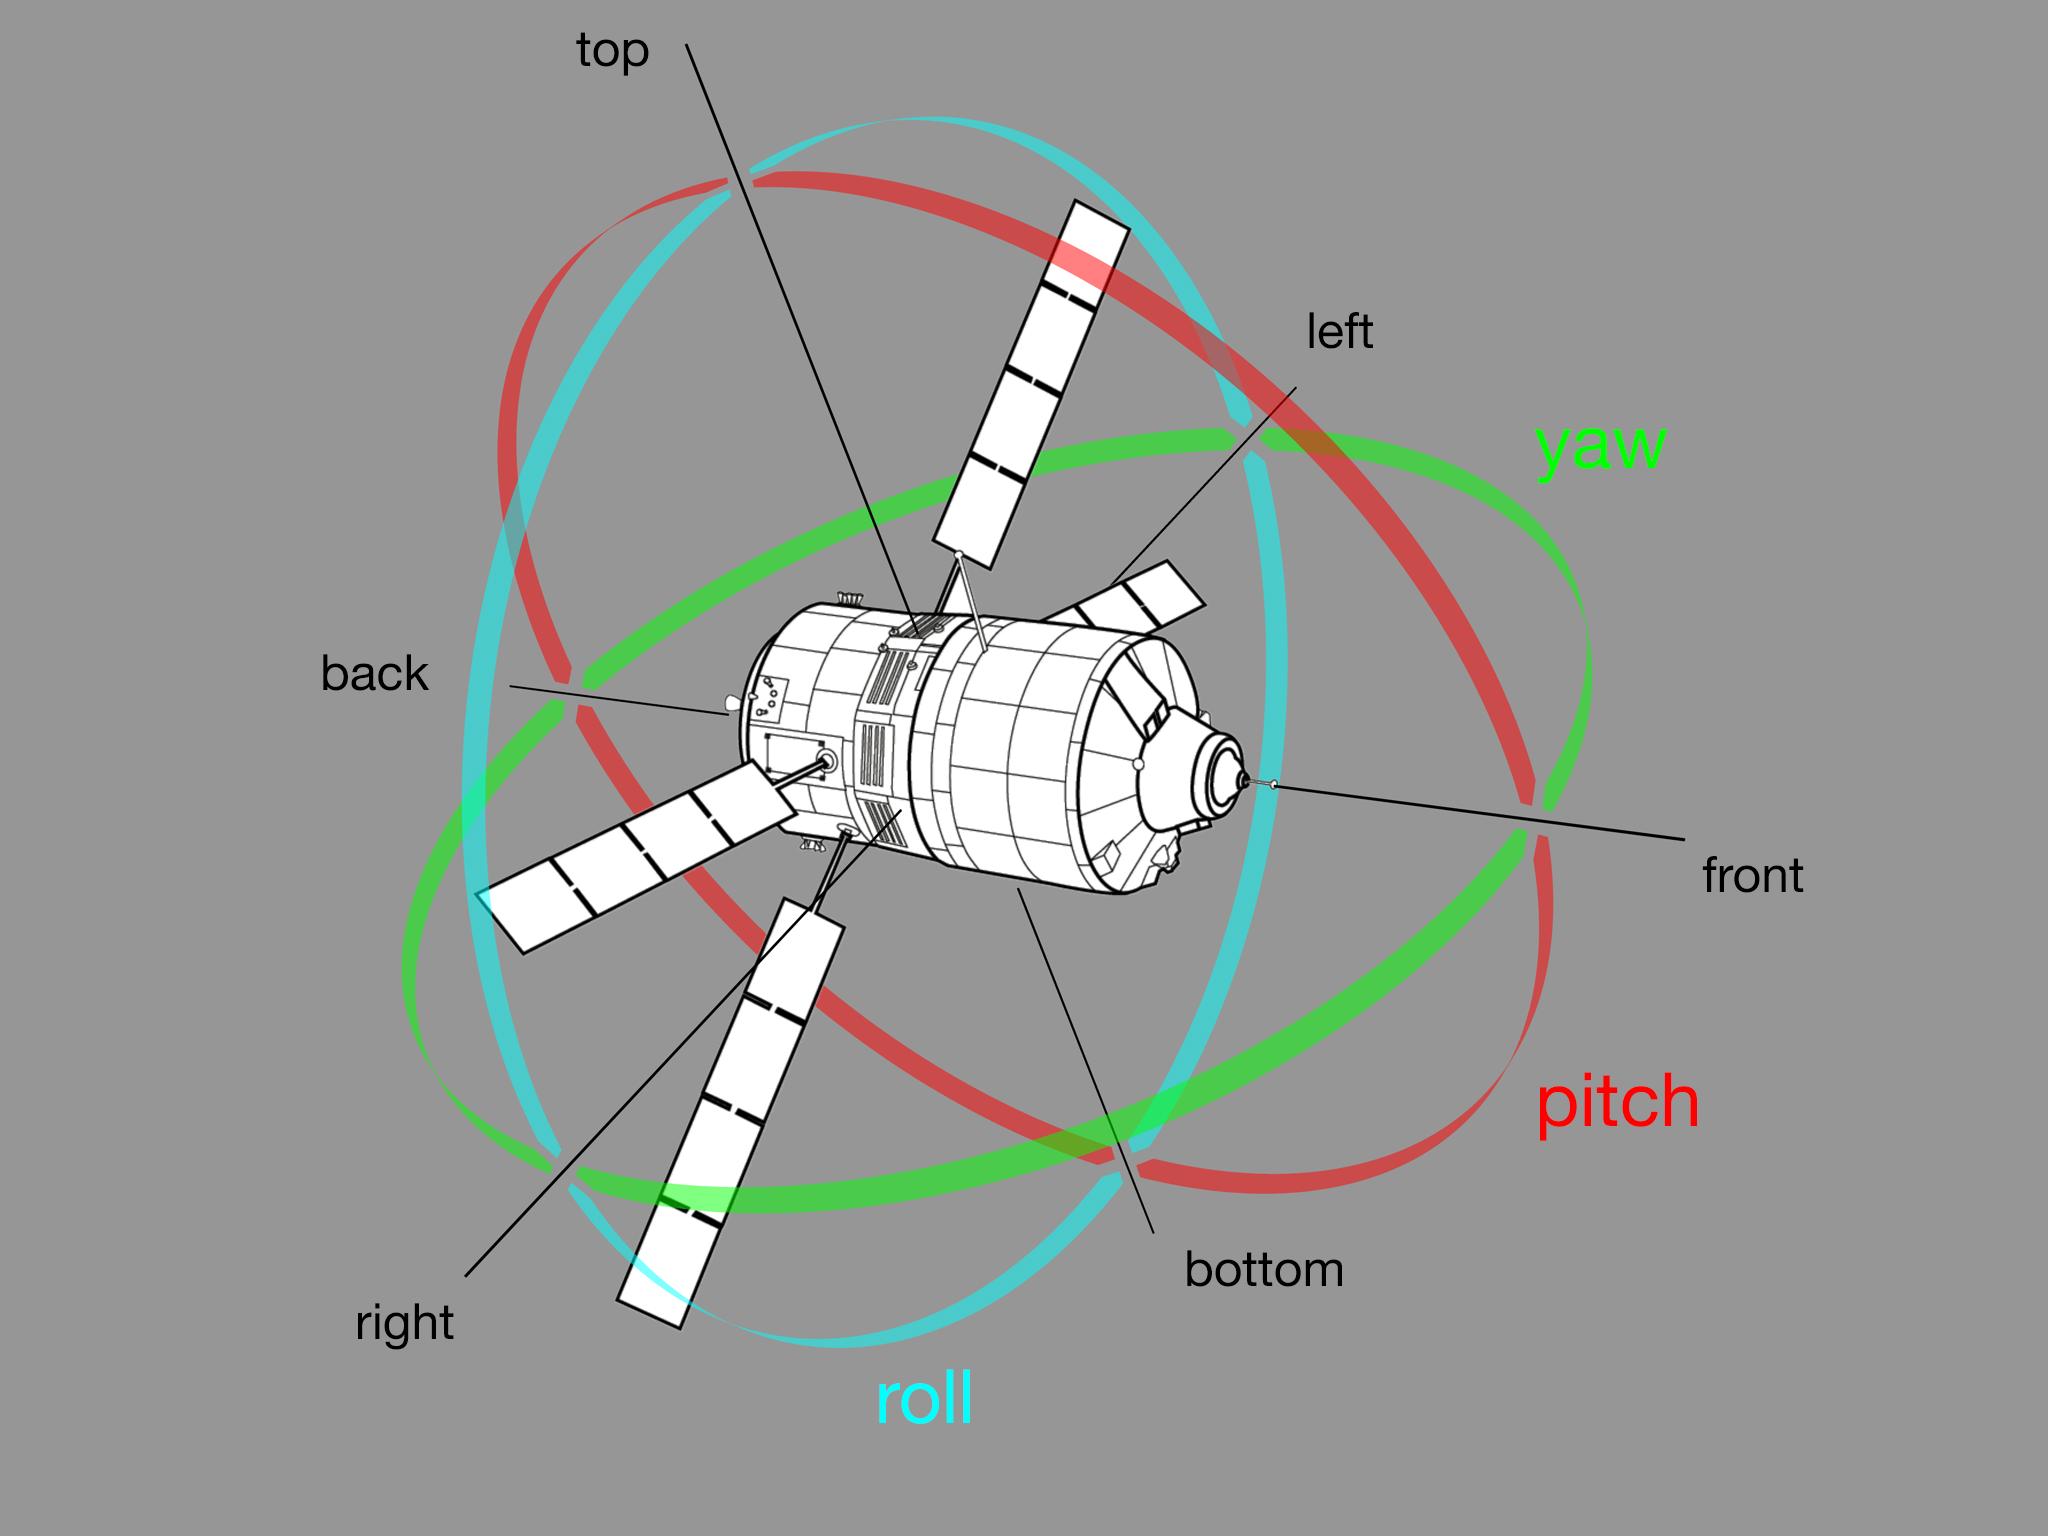 spacecraft yaw pitch roll - photo #13